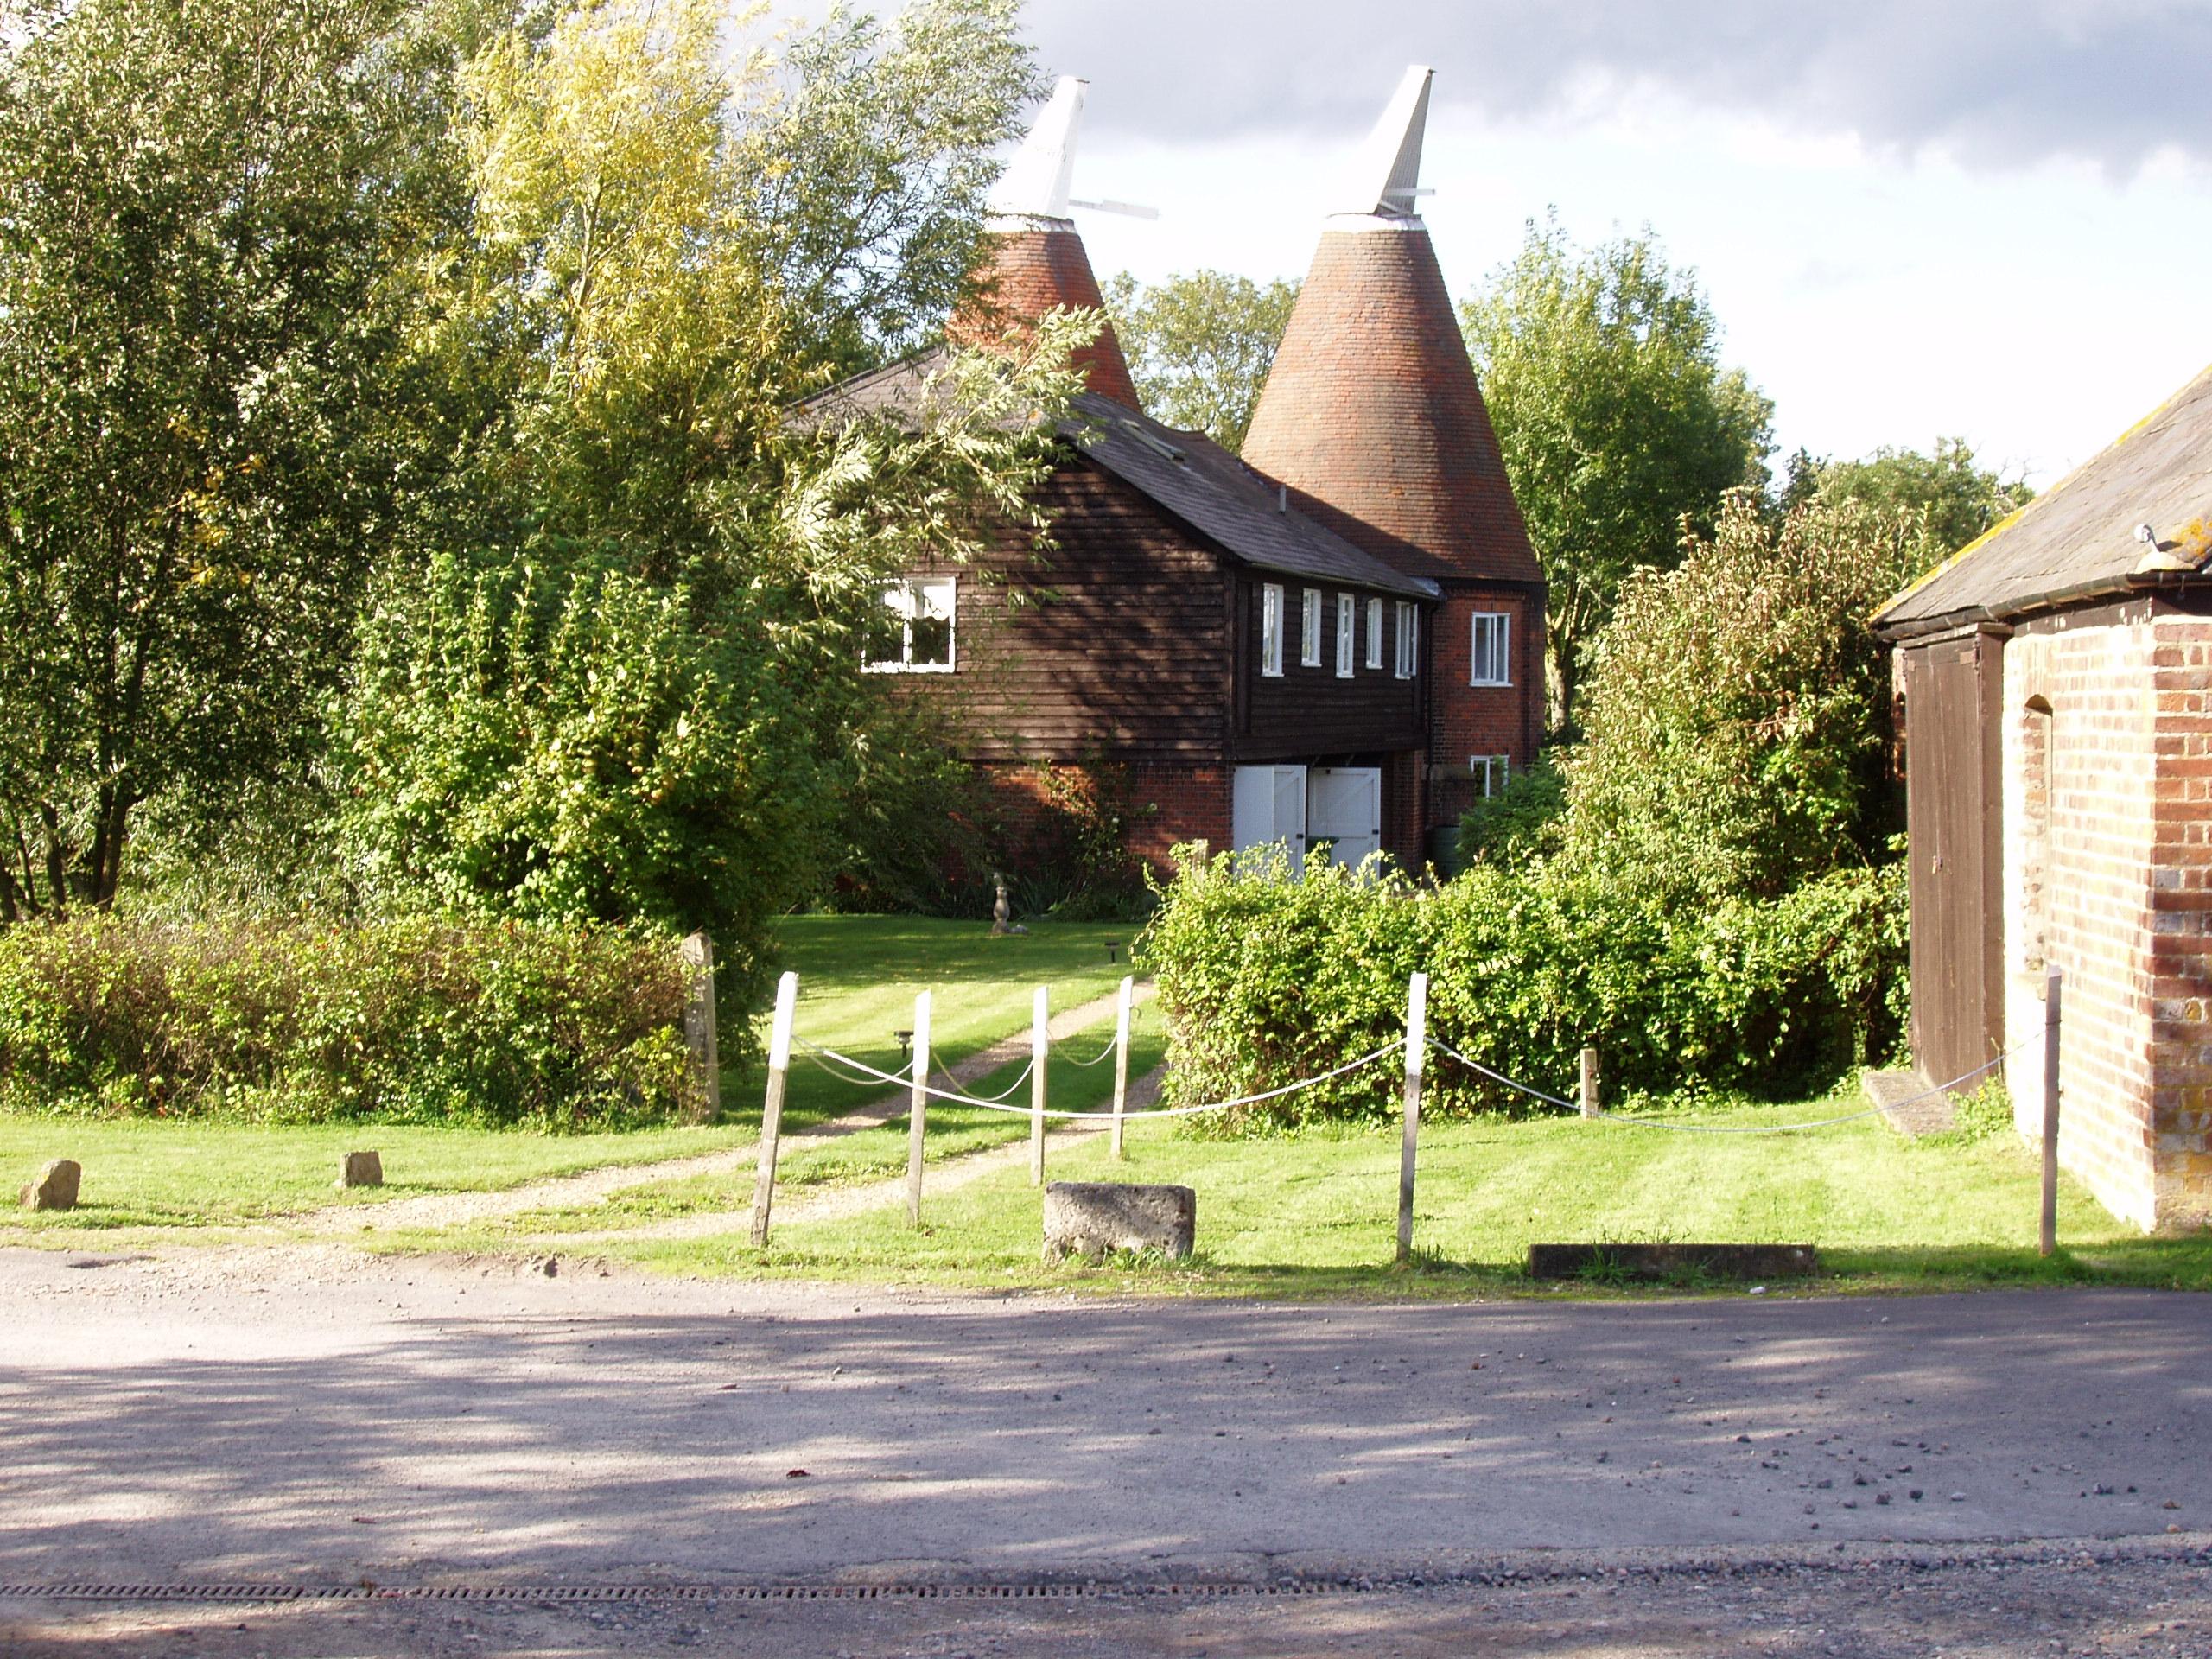 FileOast House In Tudeley Kentjpg Wikimedia Commons